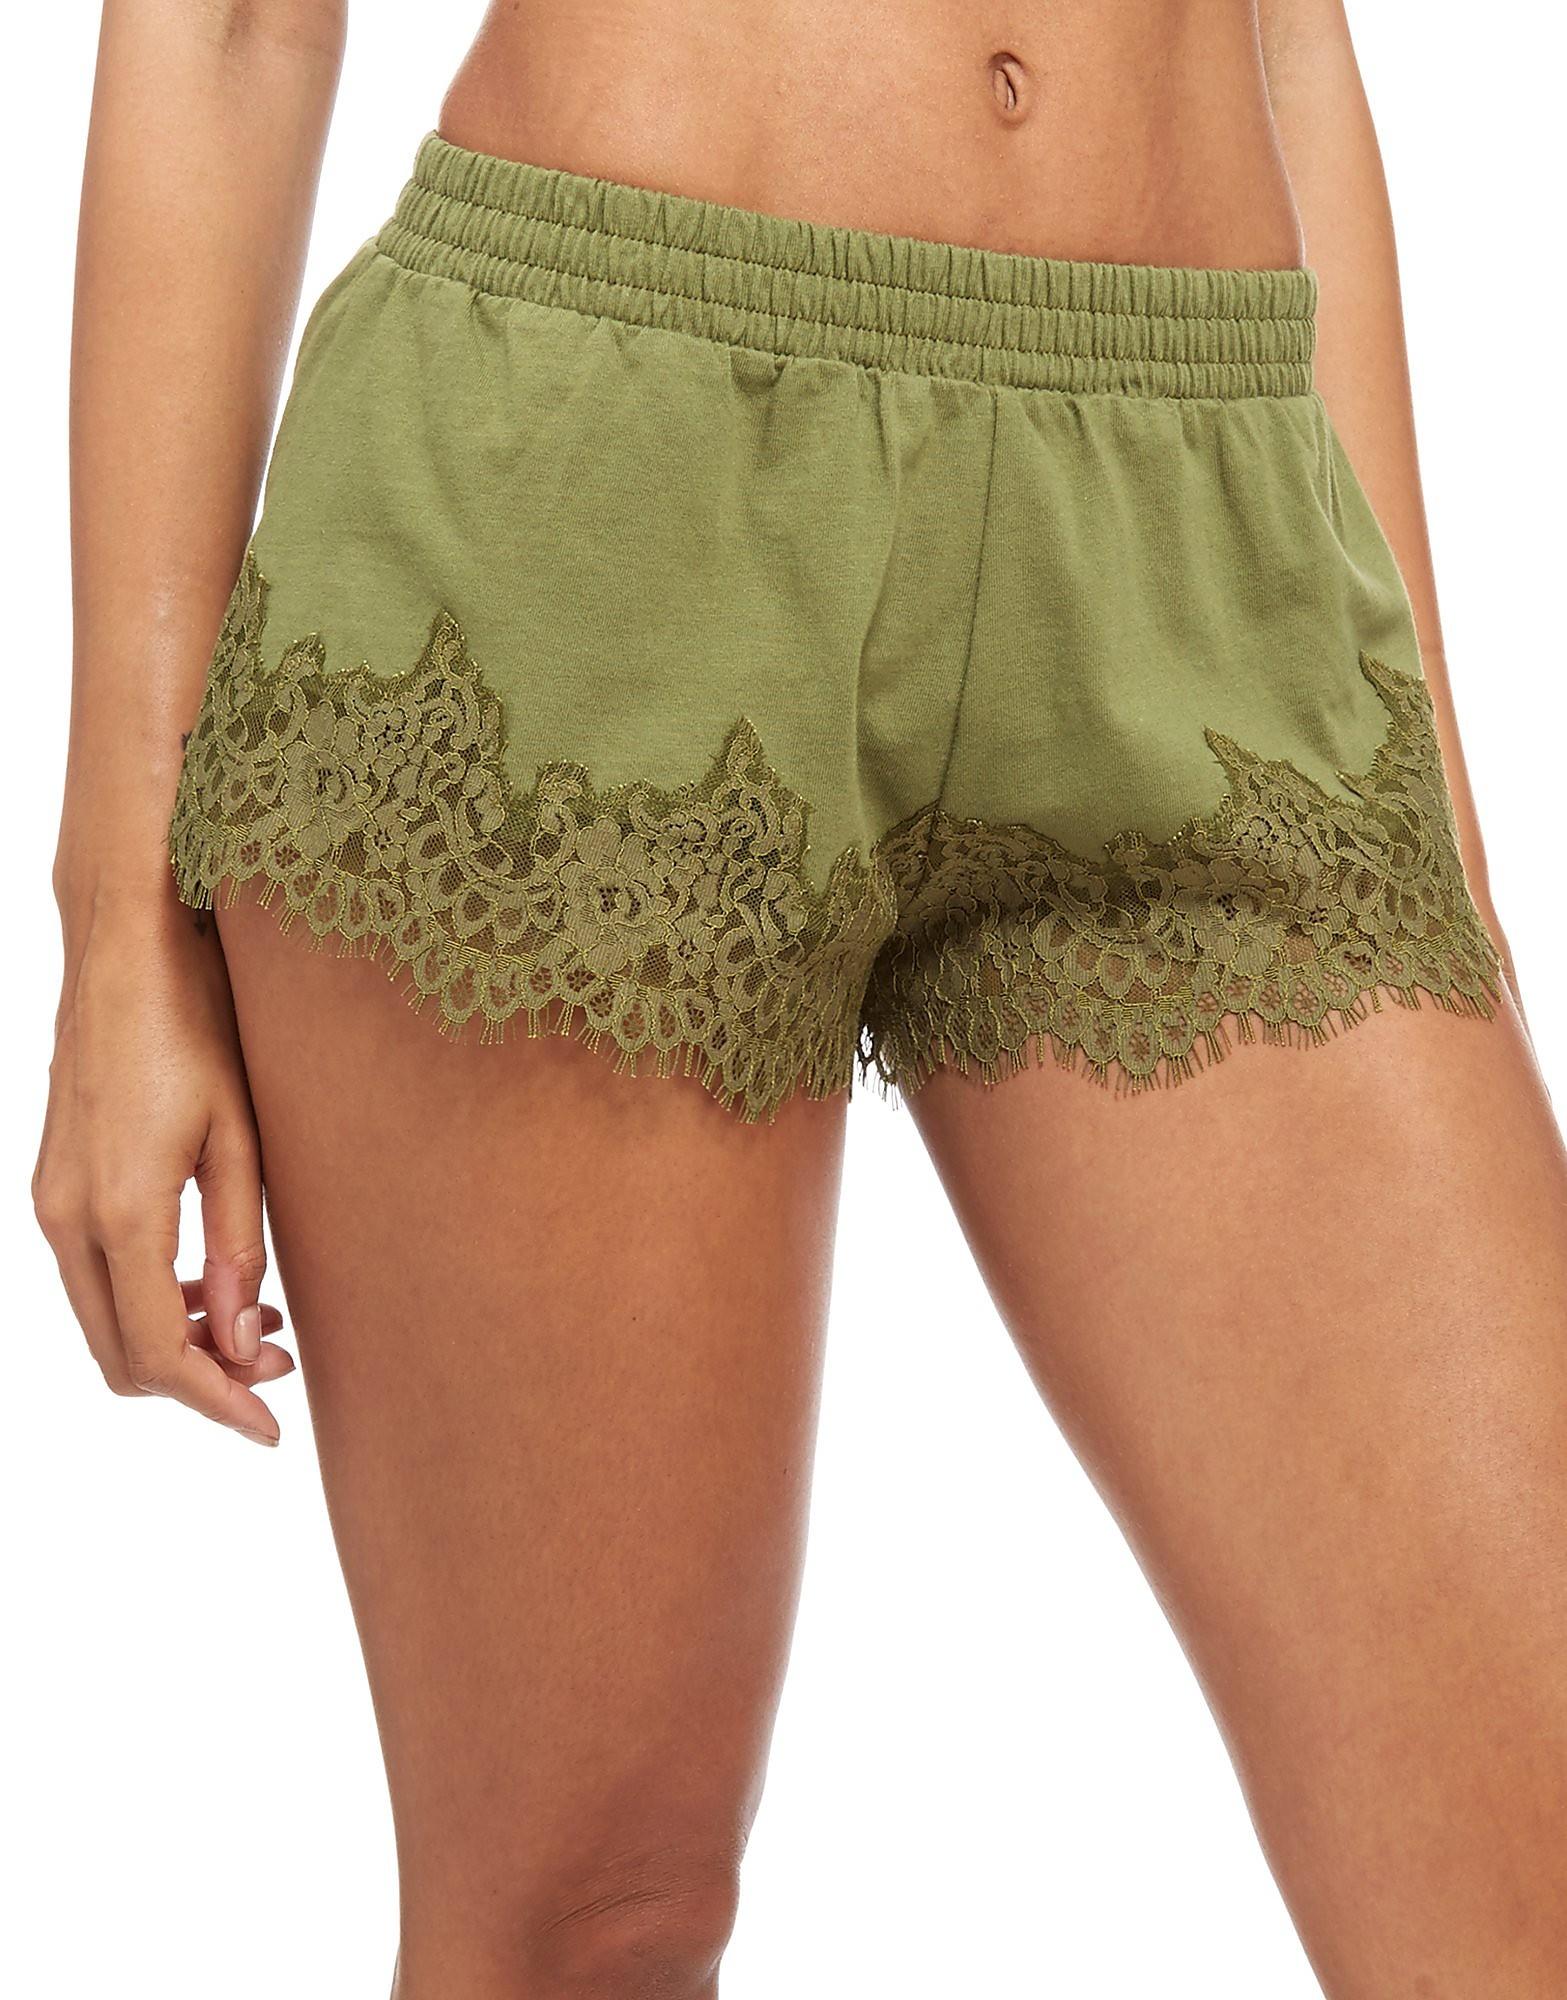 PUMA x Fenty Shorts Dames - Olive - Dames